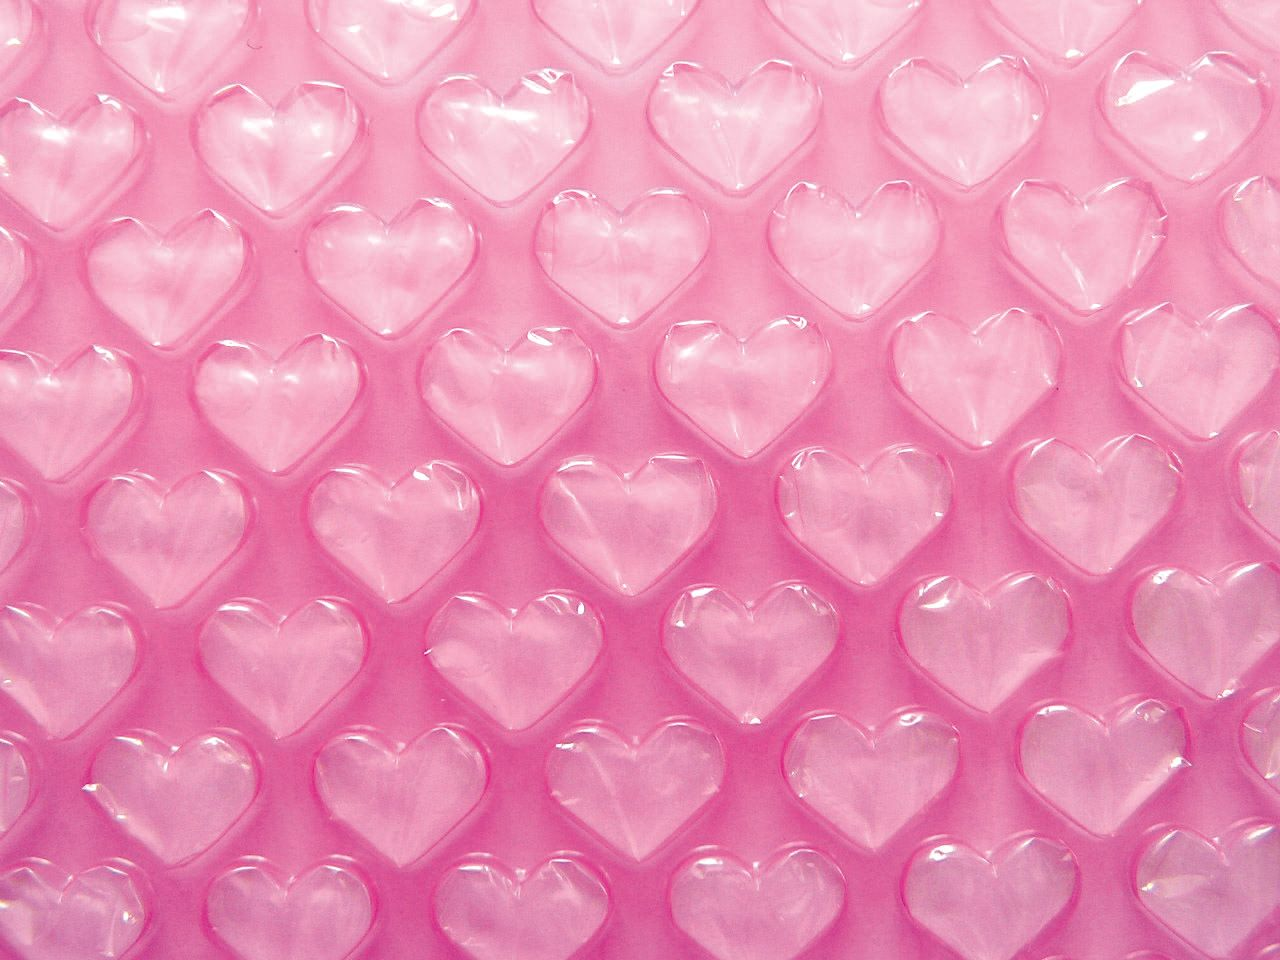 Putiputishop Rakuten Global Market Heart Shaped Bubble Wrap 60cm